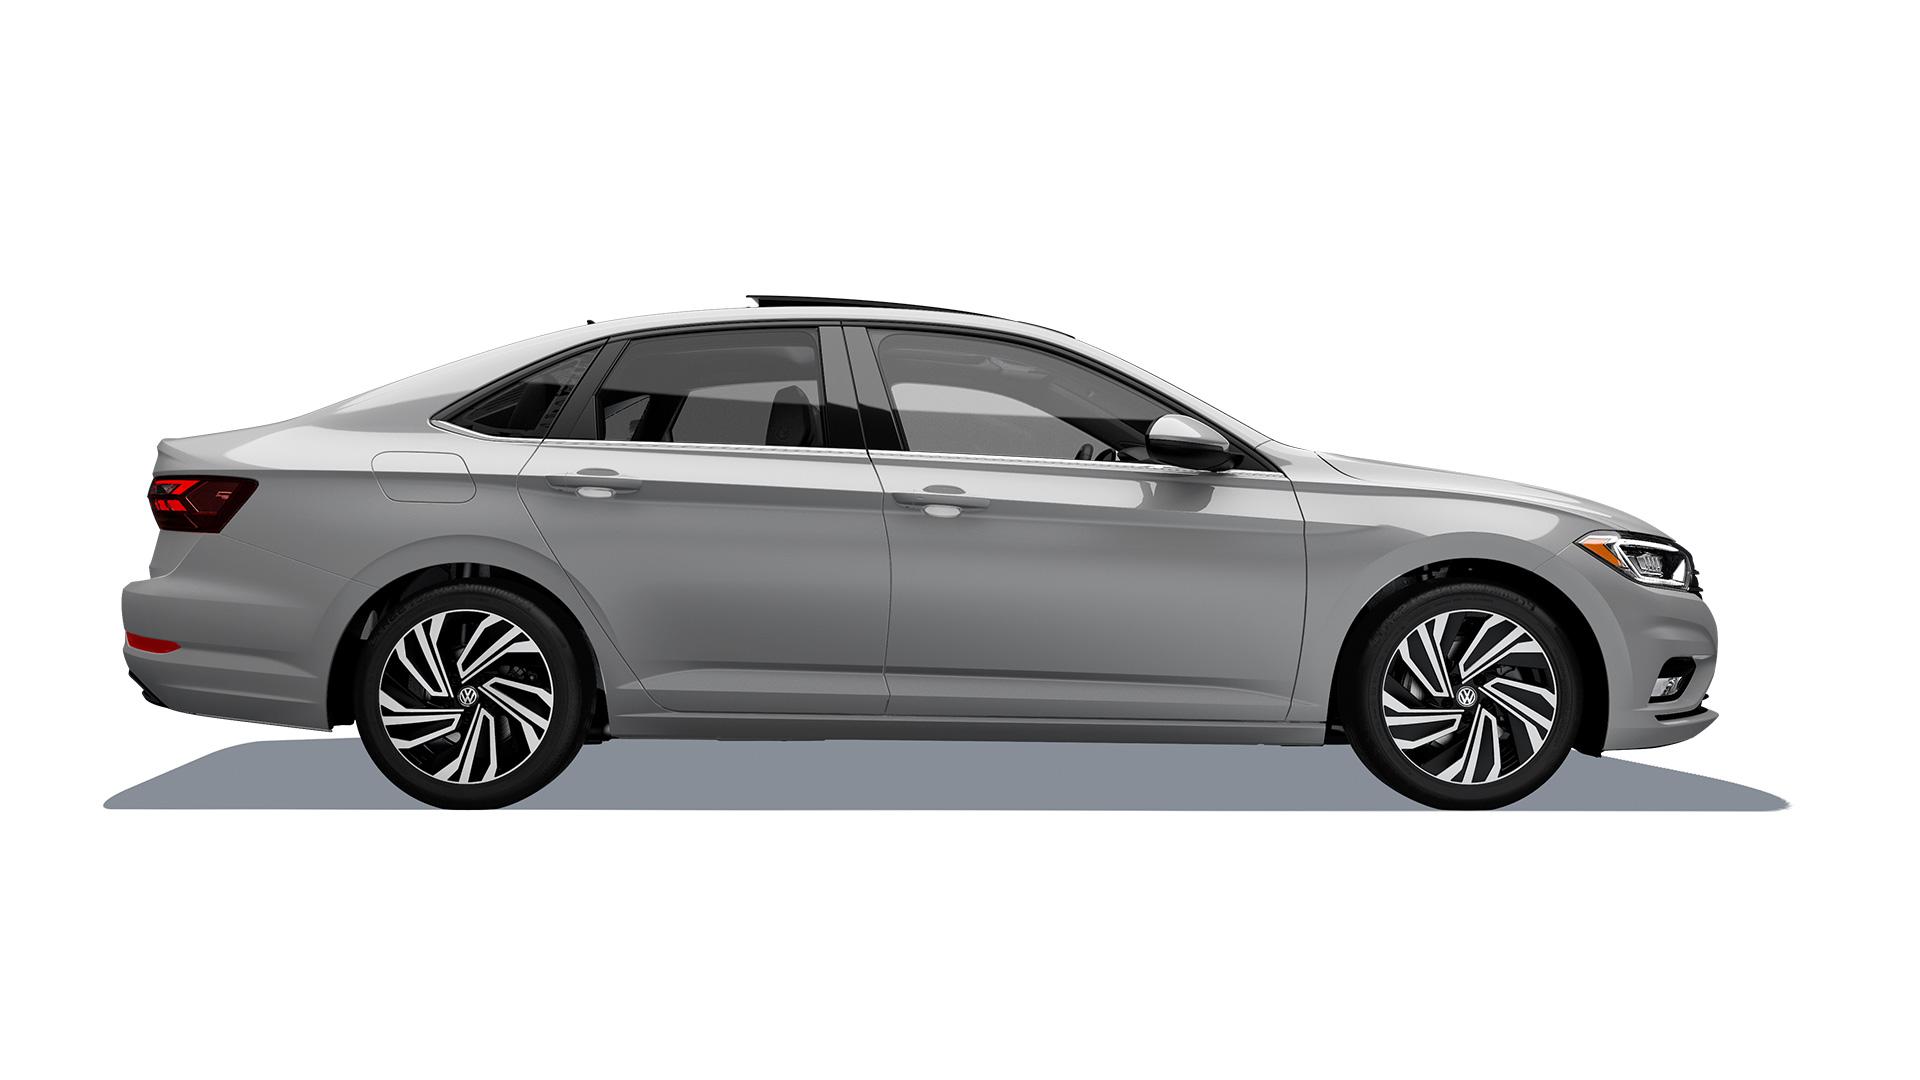 Imagen de sedán Jetta de Volkswagen, catalogado como seguro por Latin NCAP